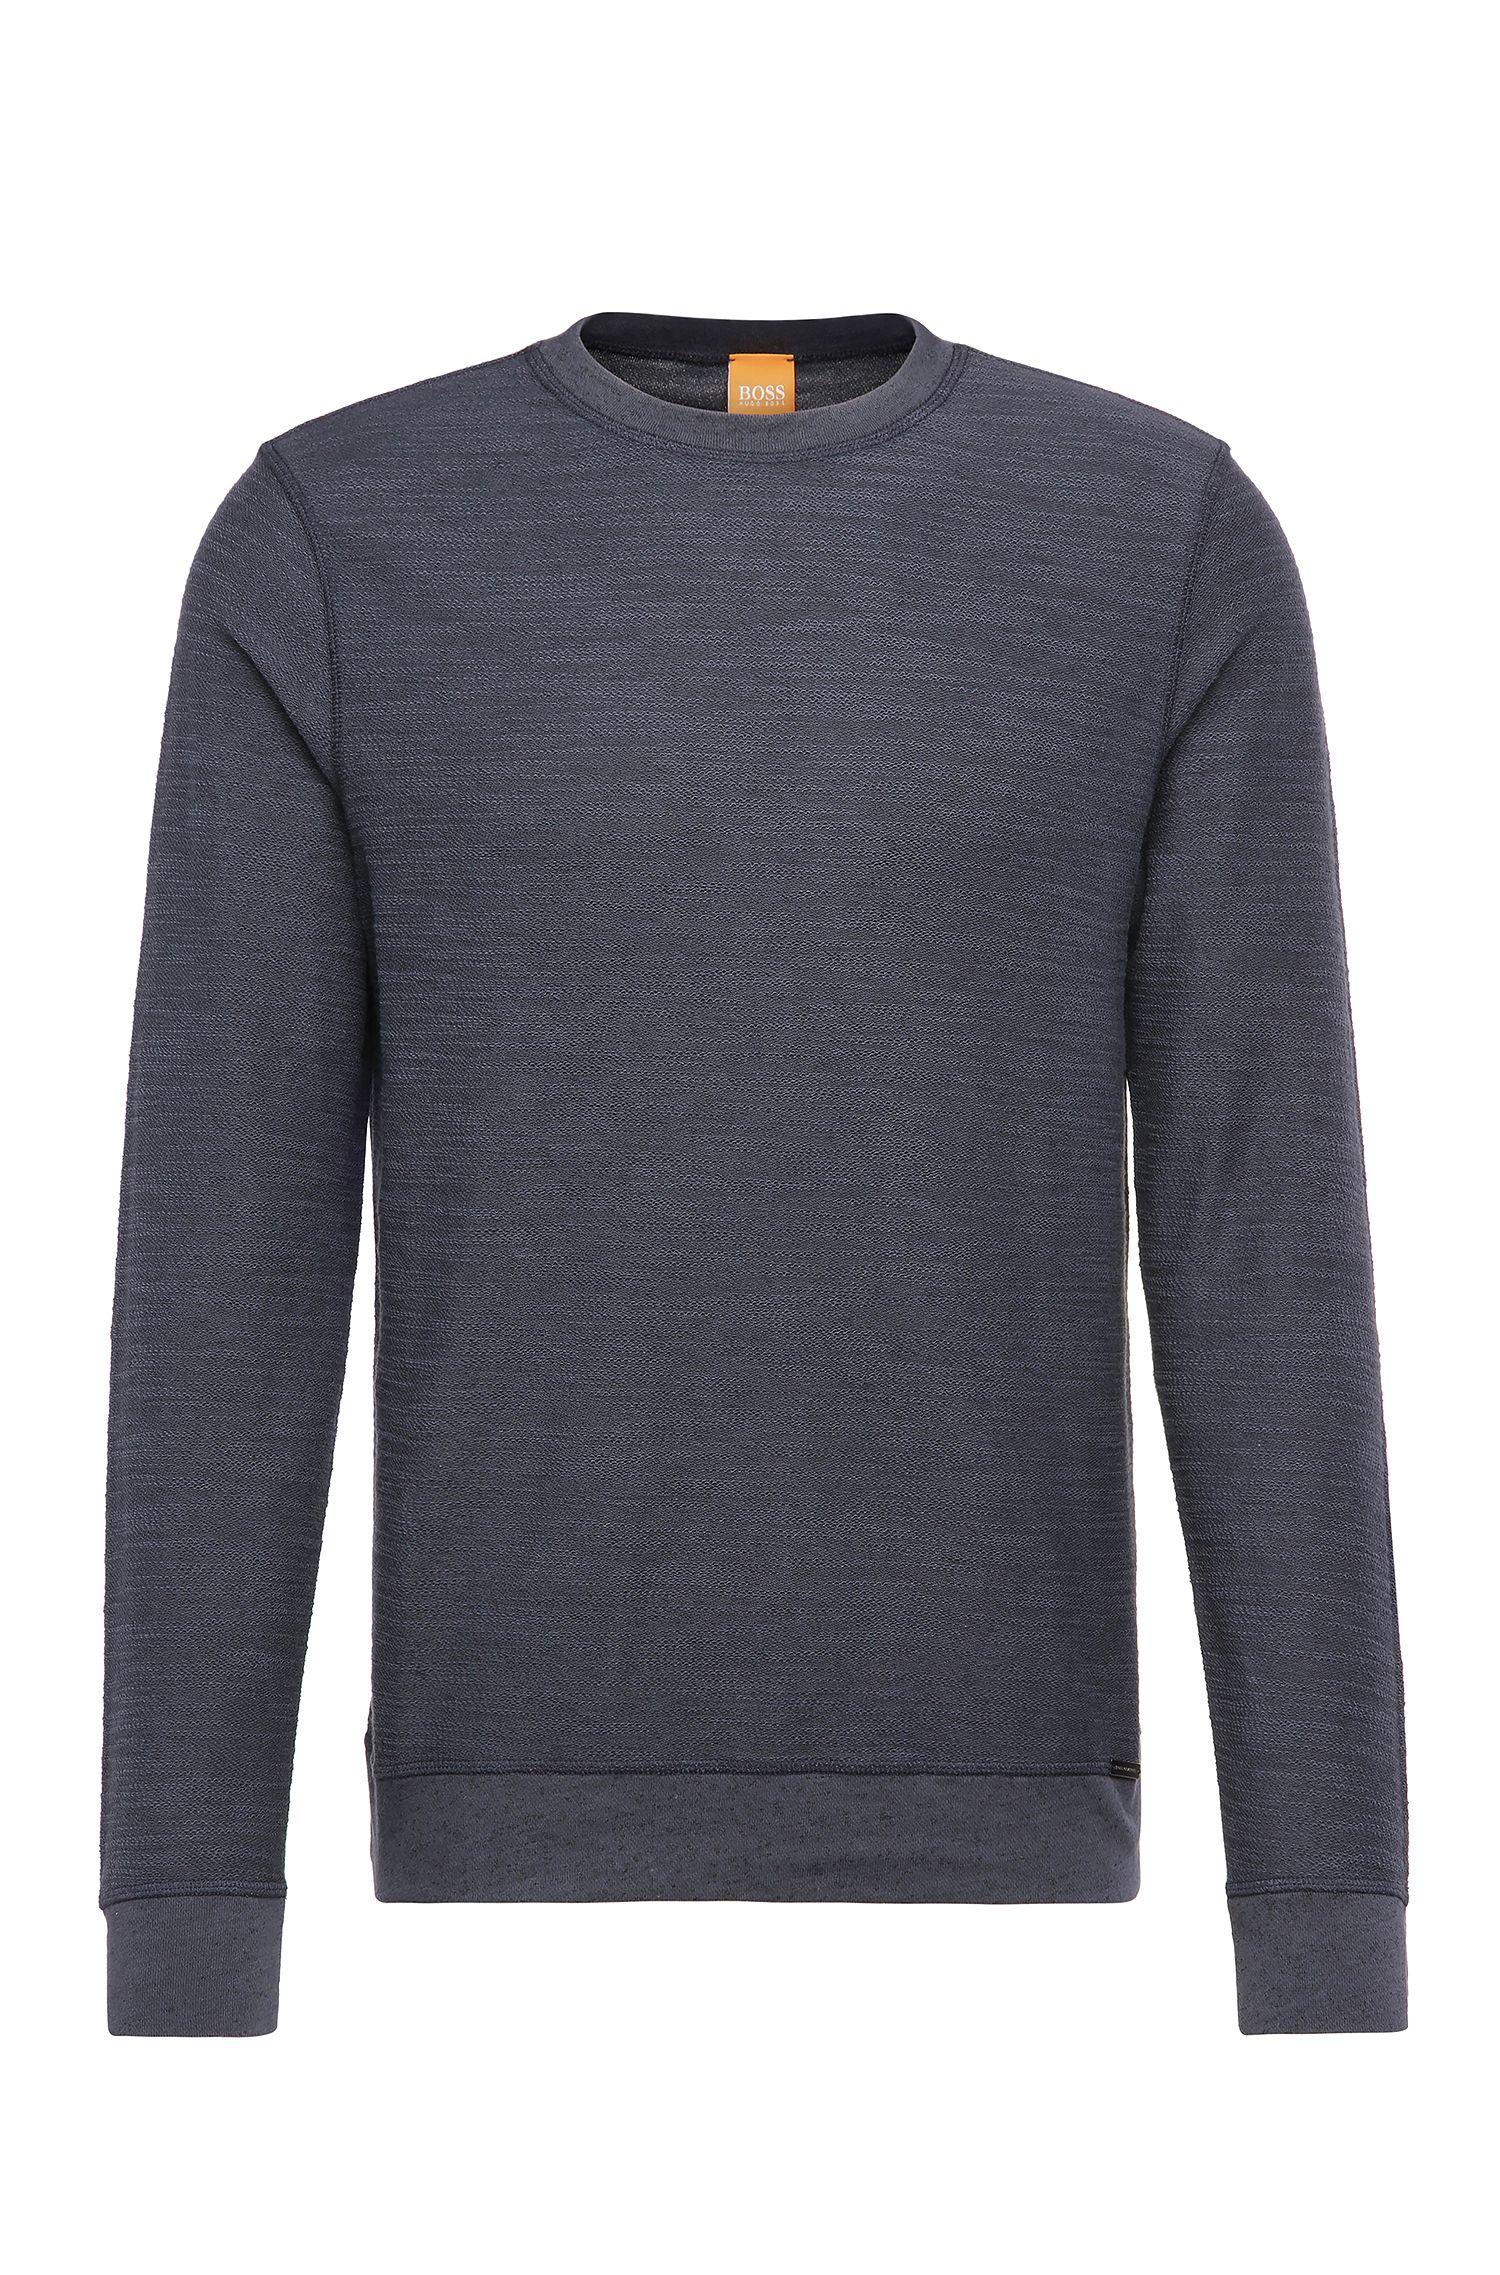 Relaxed-Fit Sweatshirt aus Baumwoll-Mix: ´Woice`